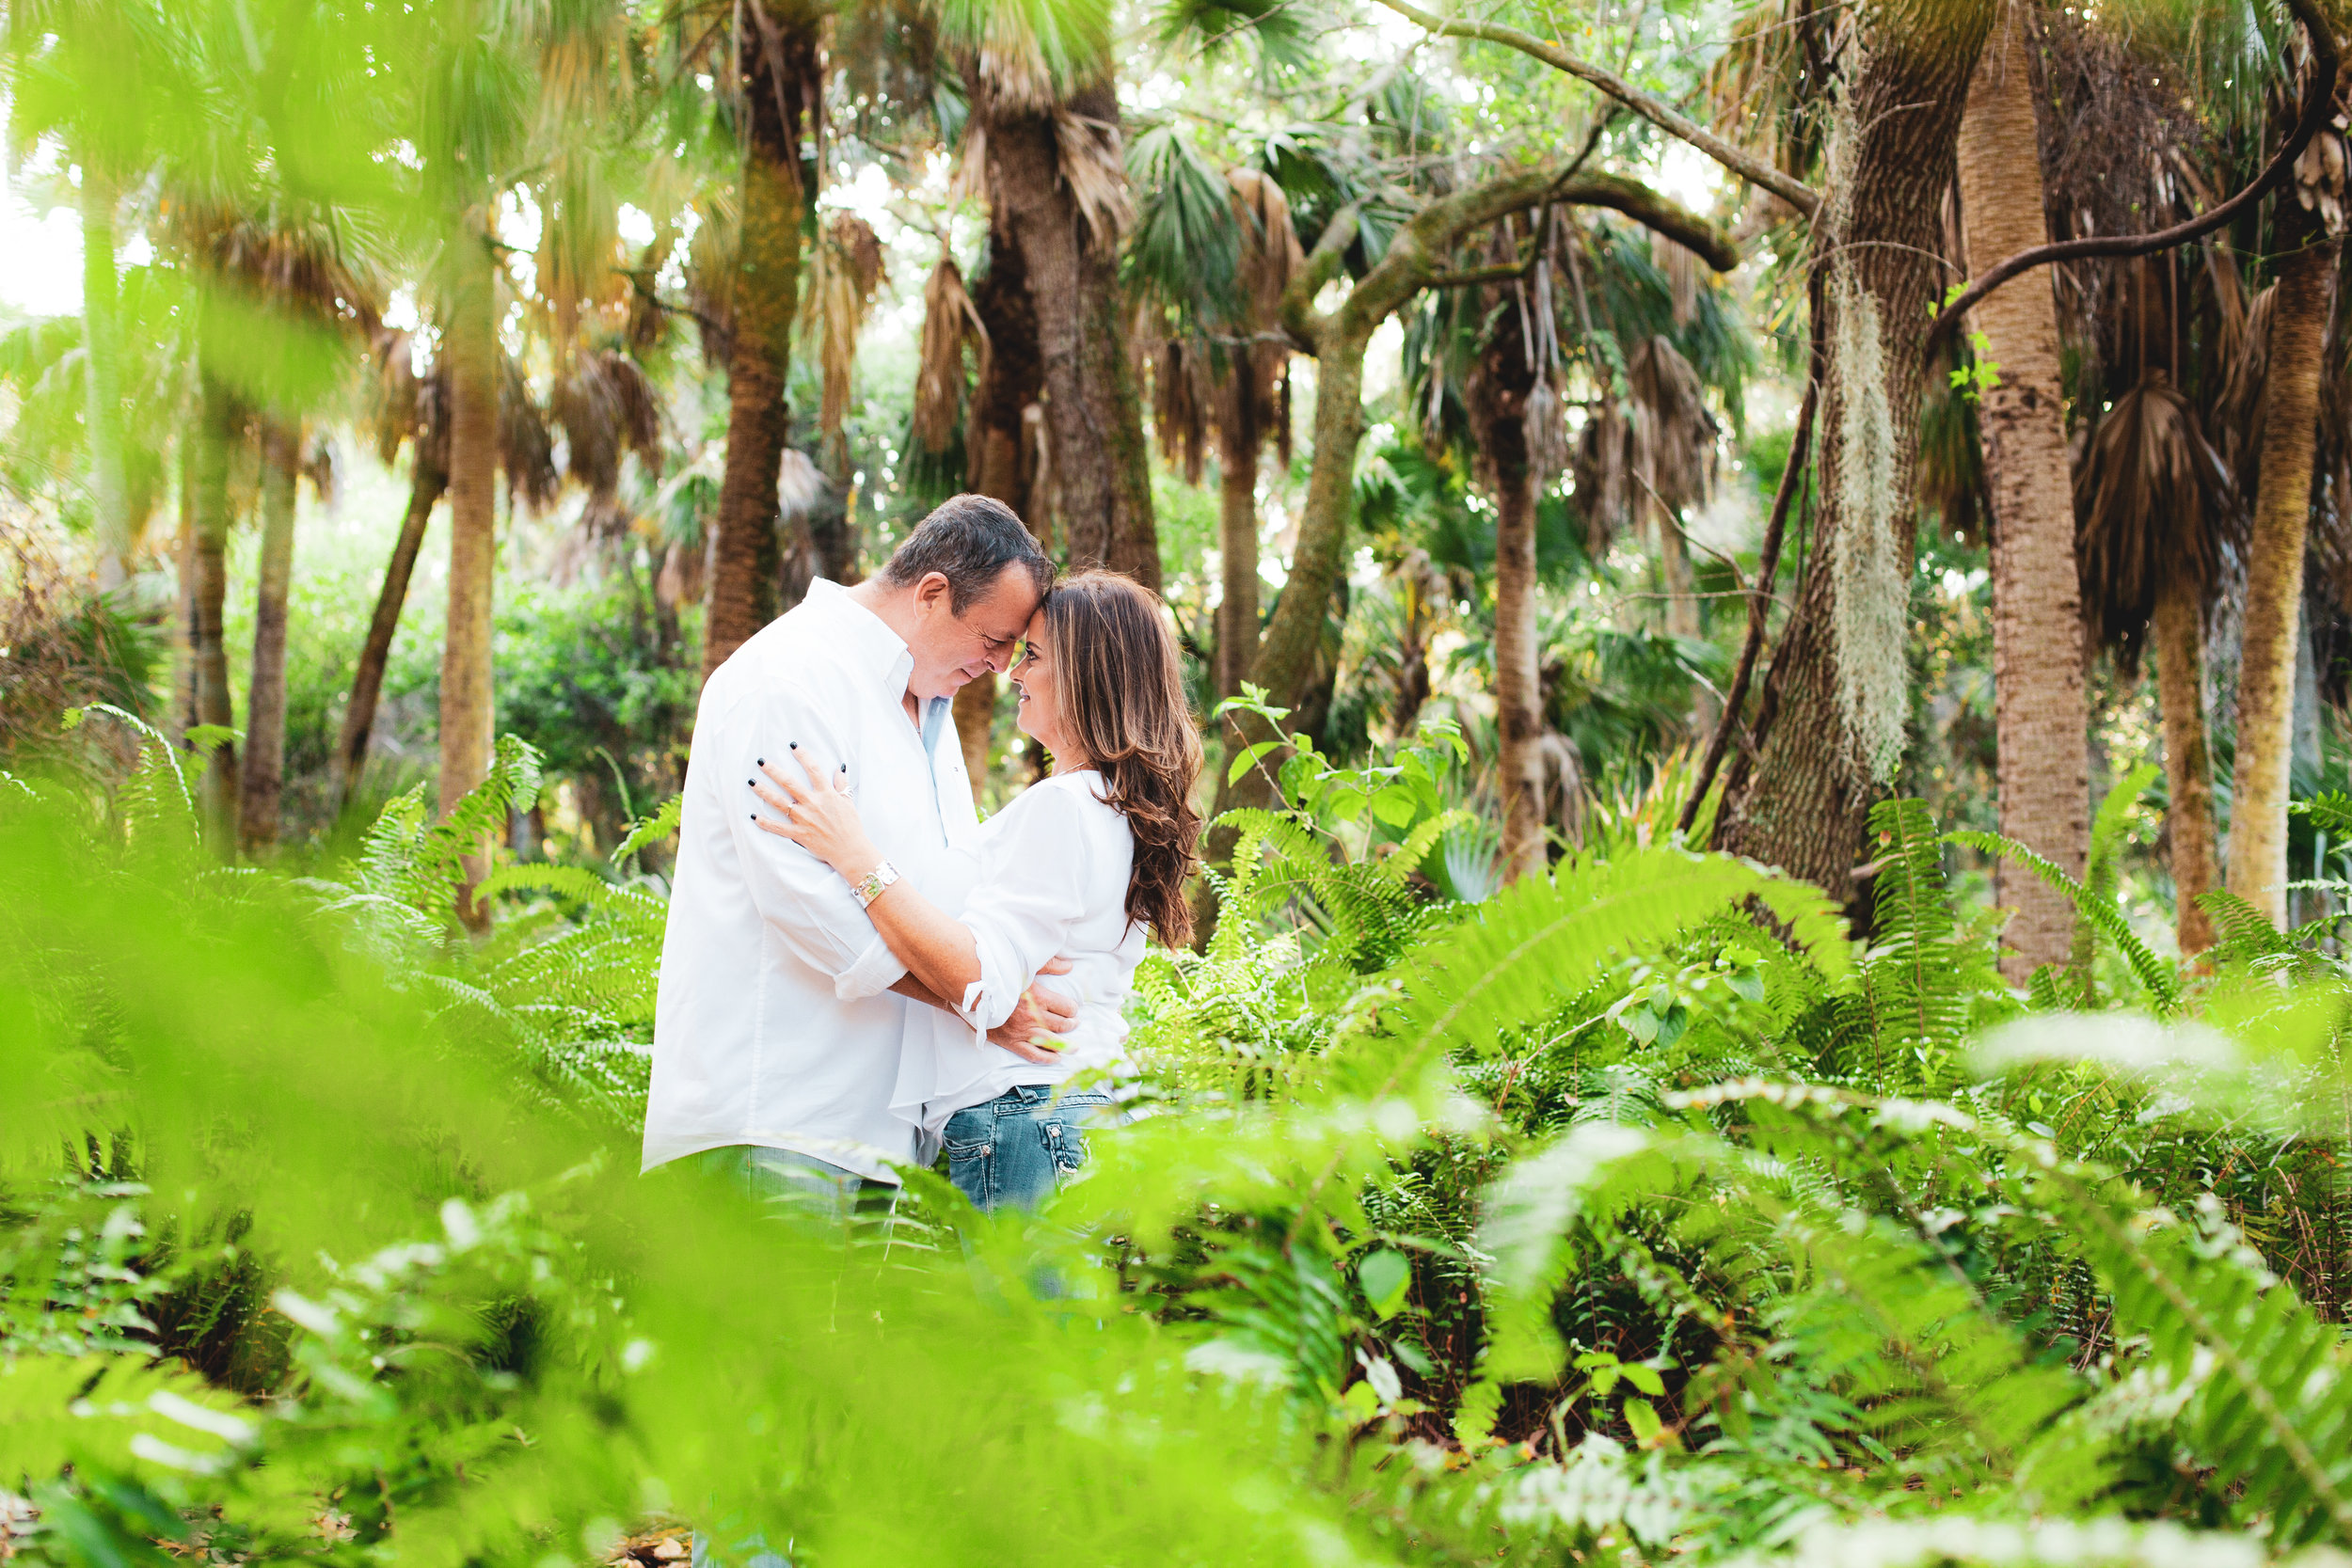 kelilina photography hawaii florida destination engagement wedding family photography-3.jpg